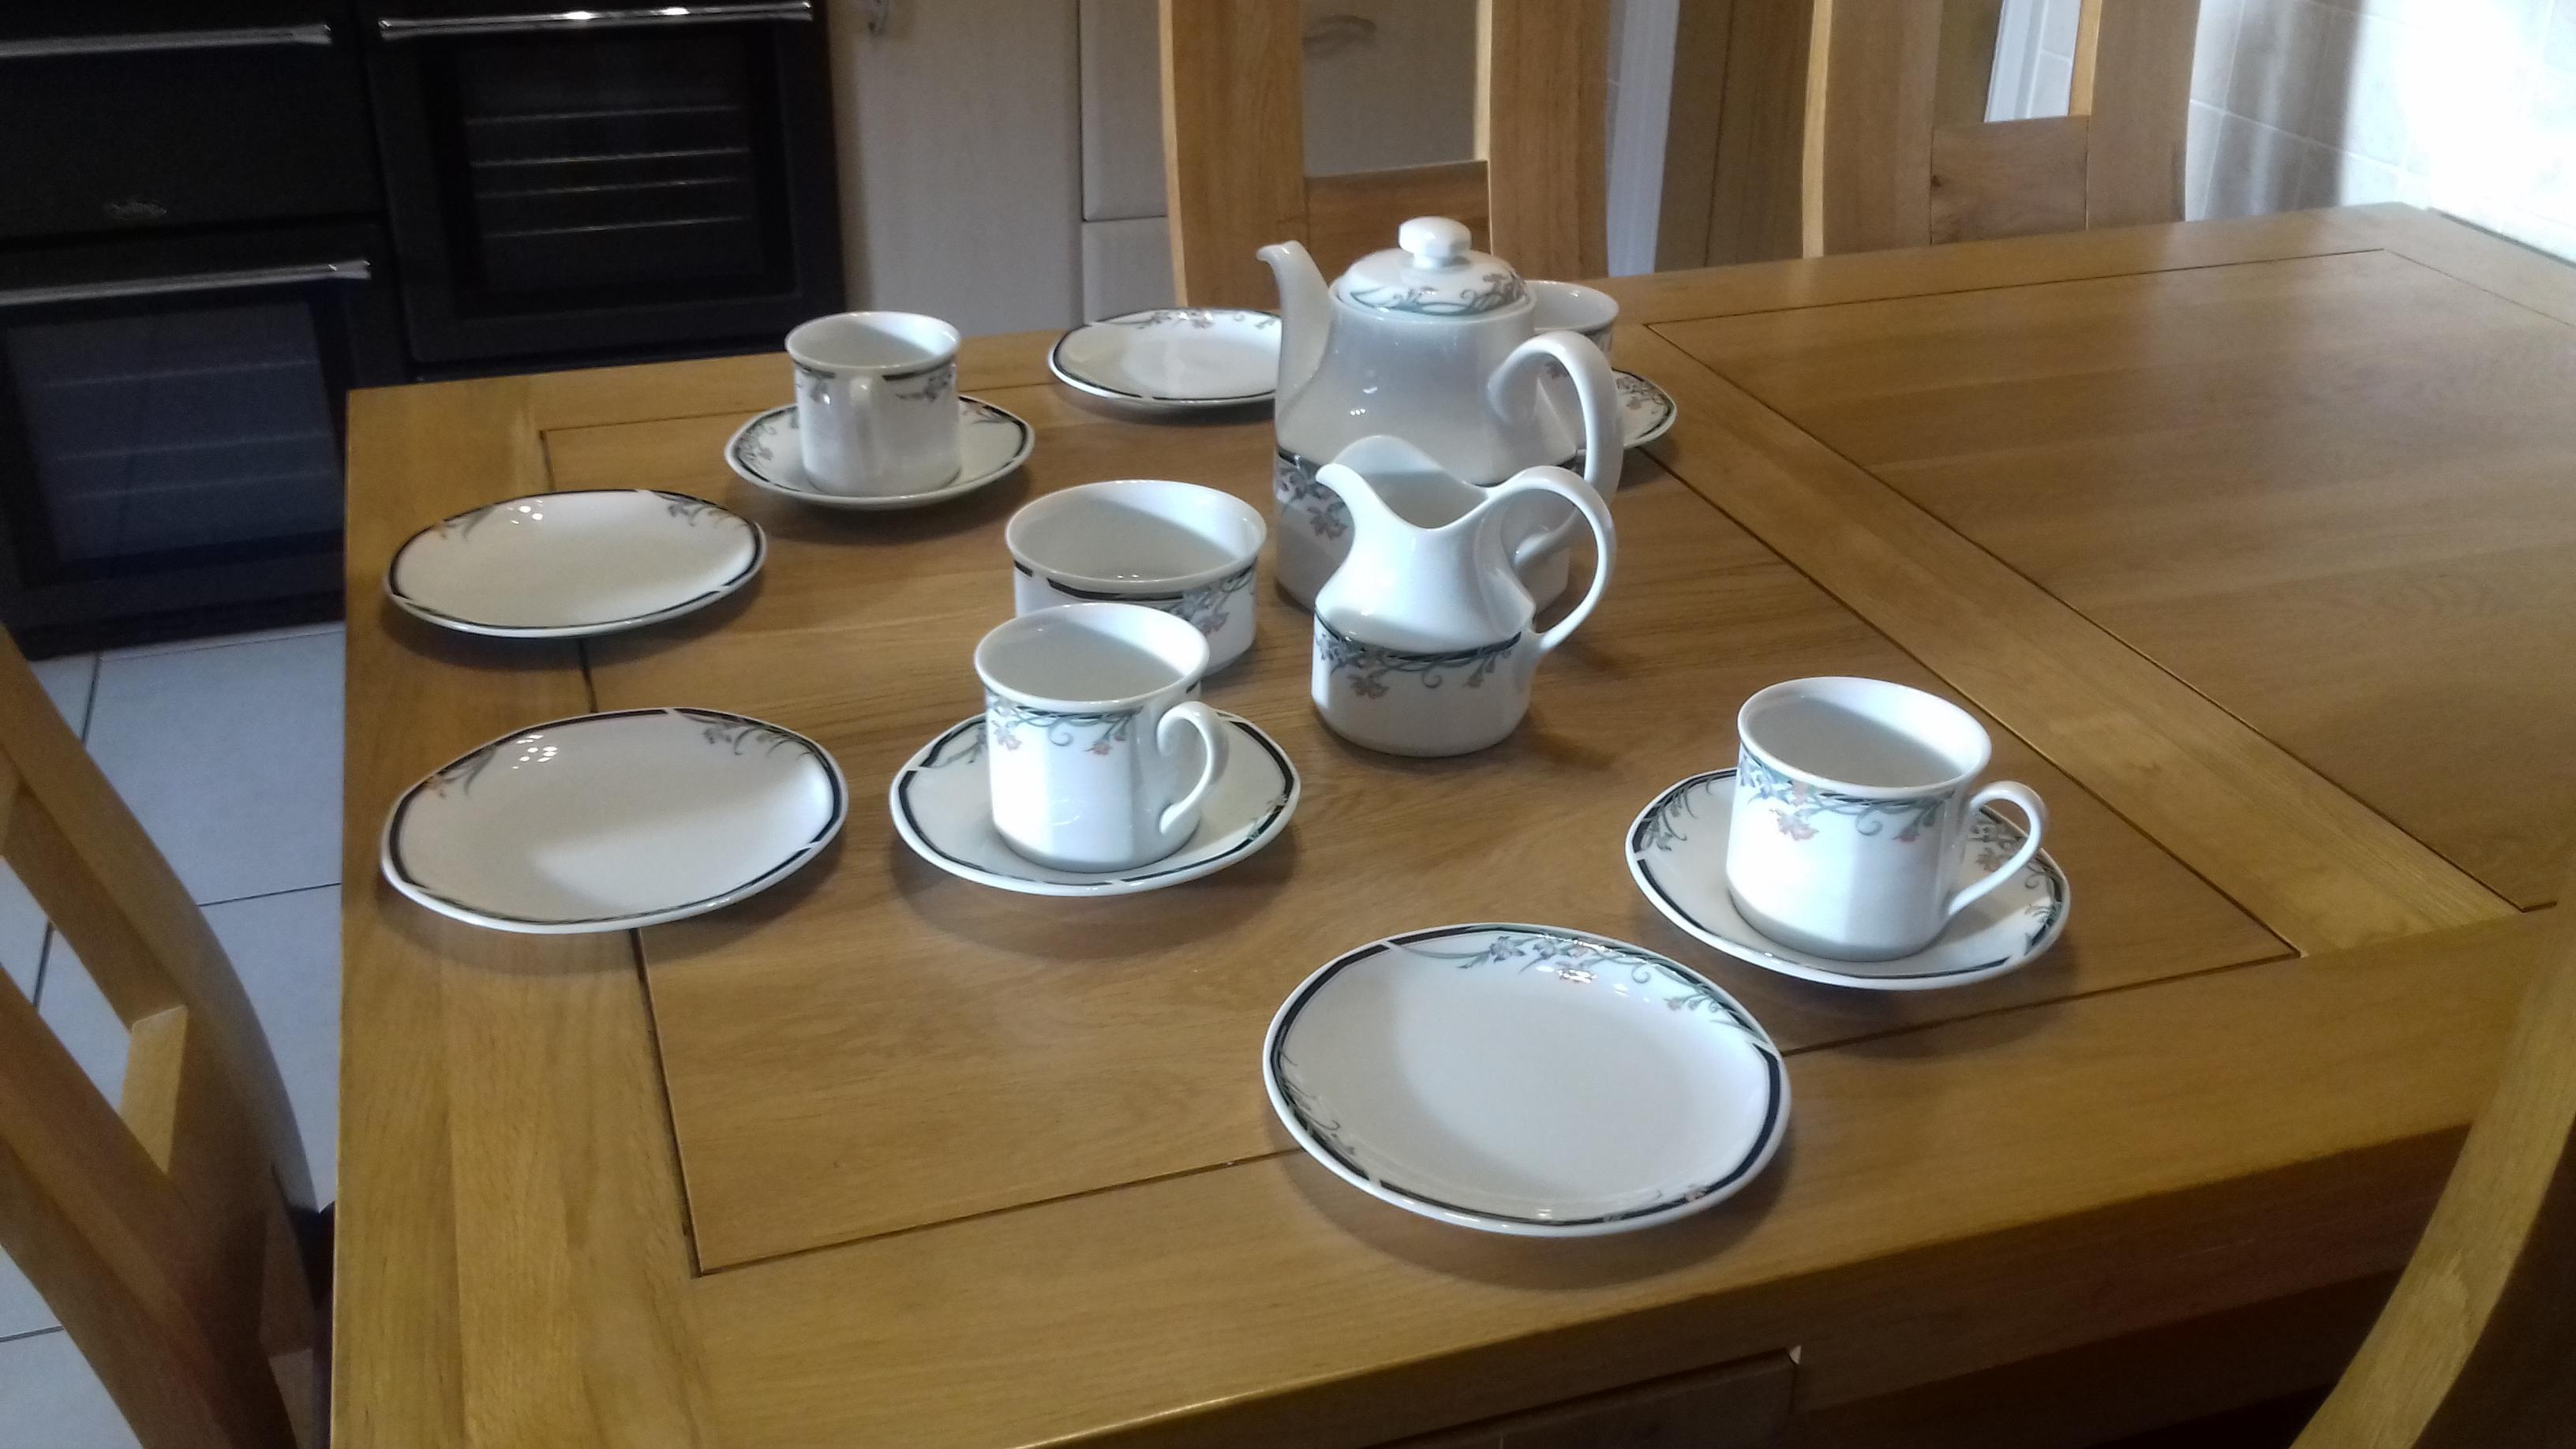 Royal Doulton China Tea Set For Sale